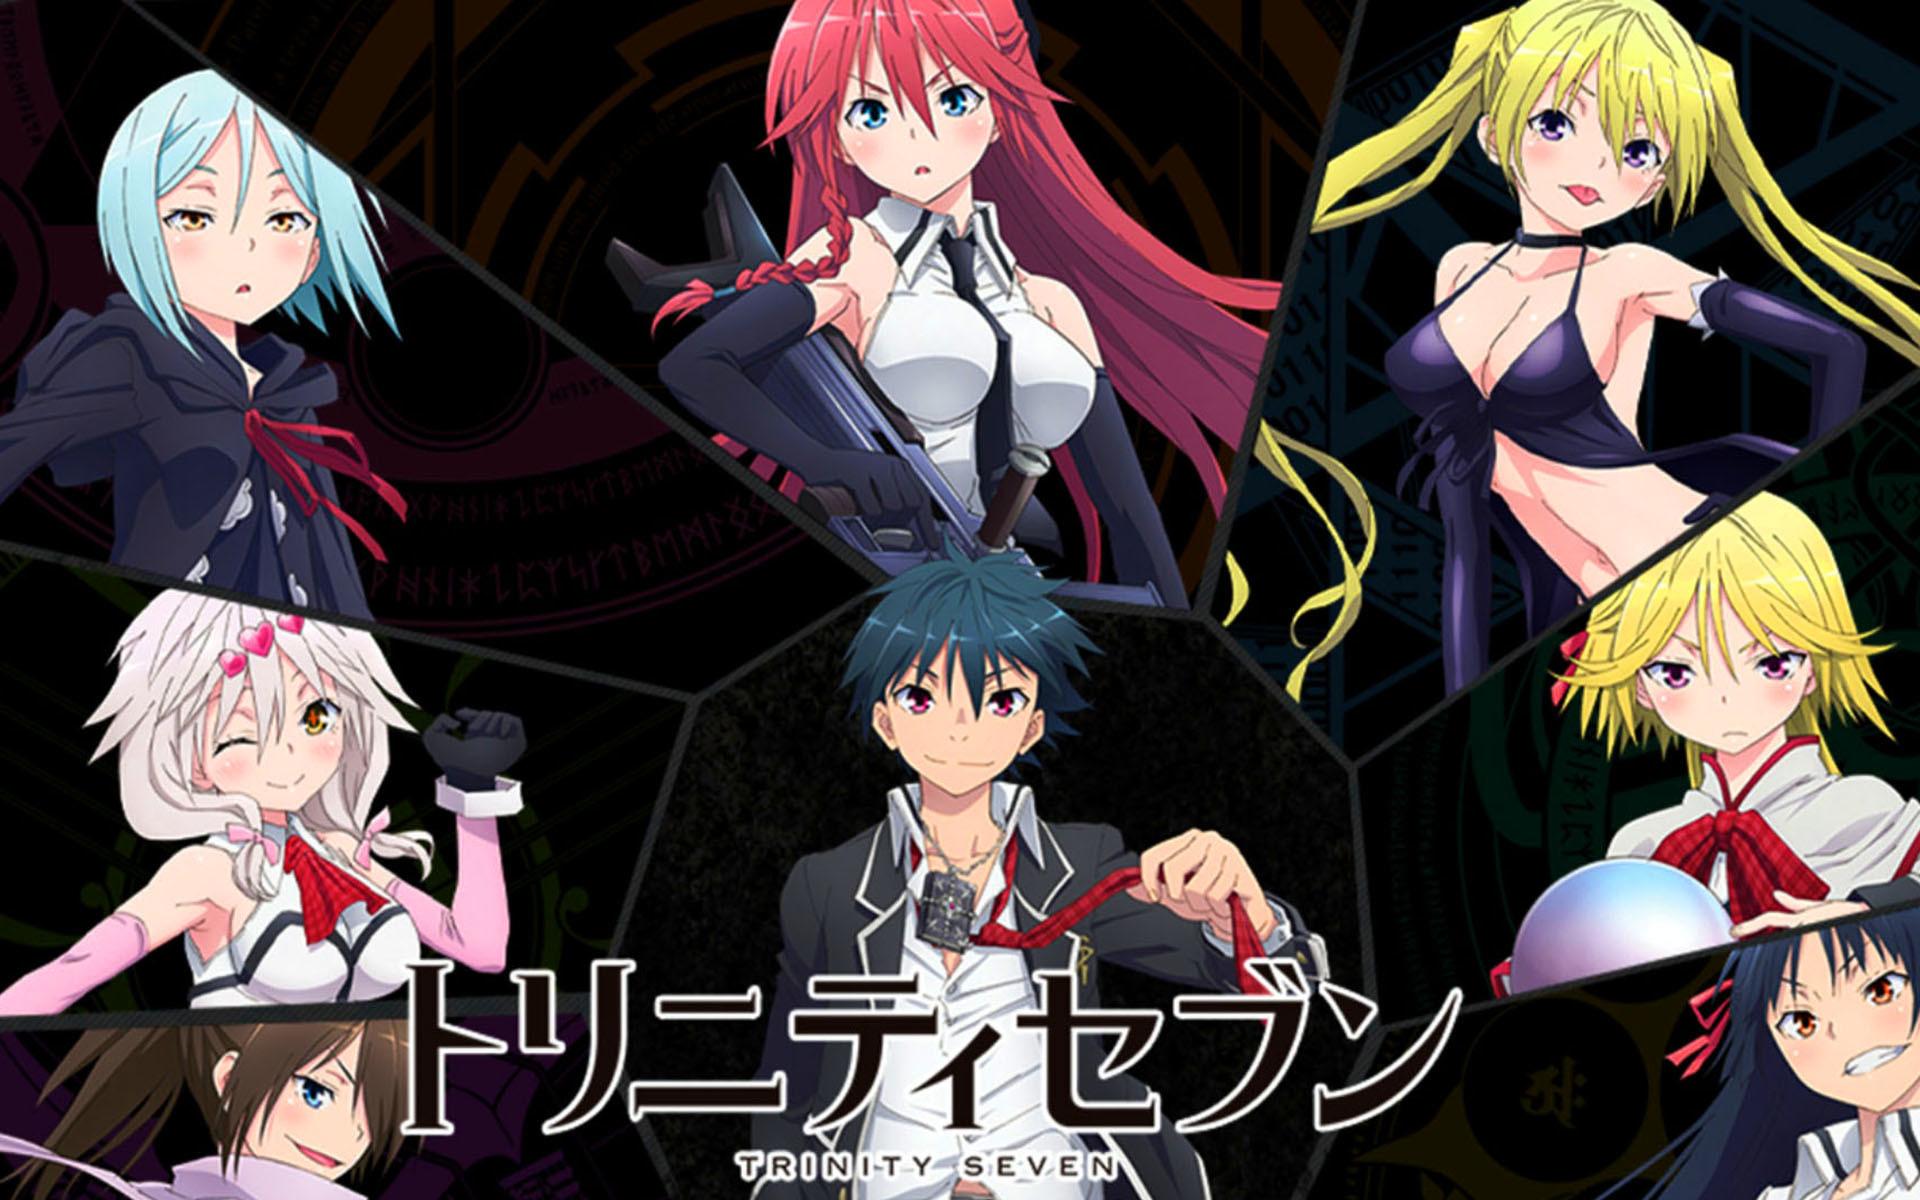 Trinity Seven Anime Wallpaper